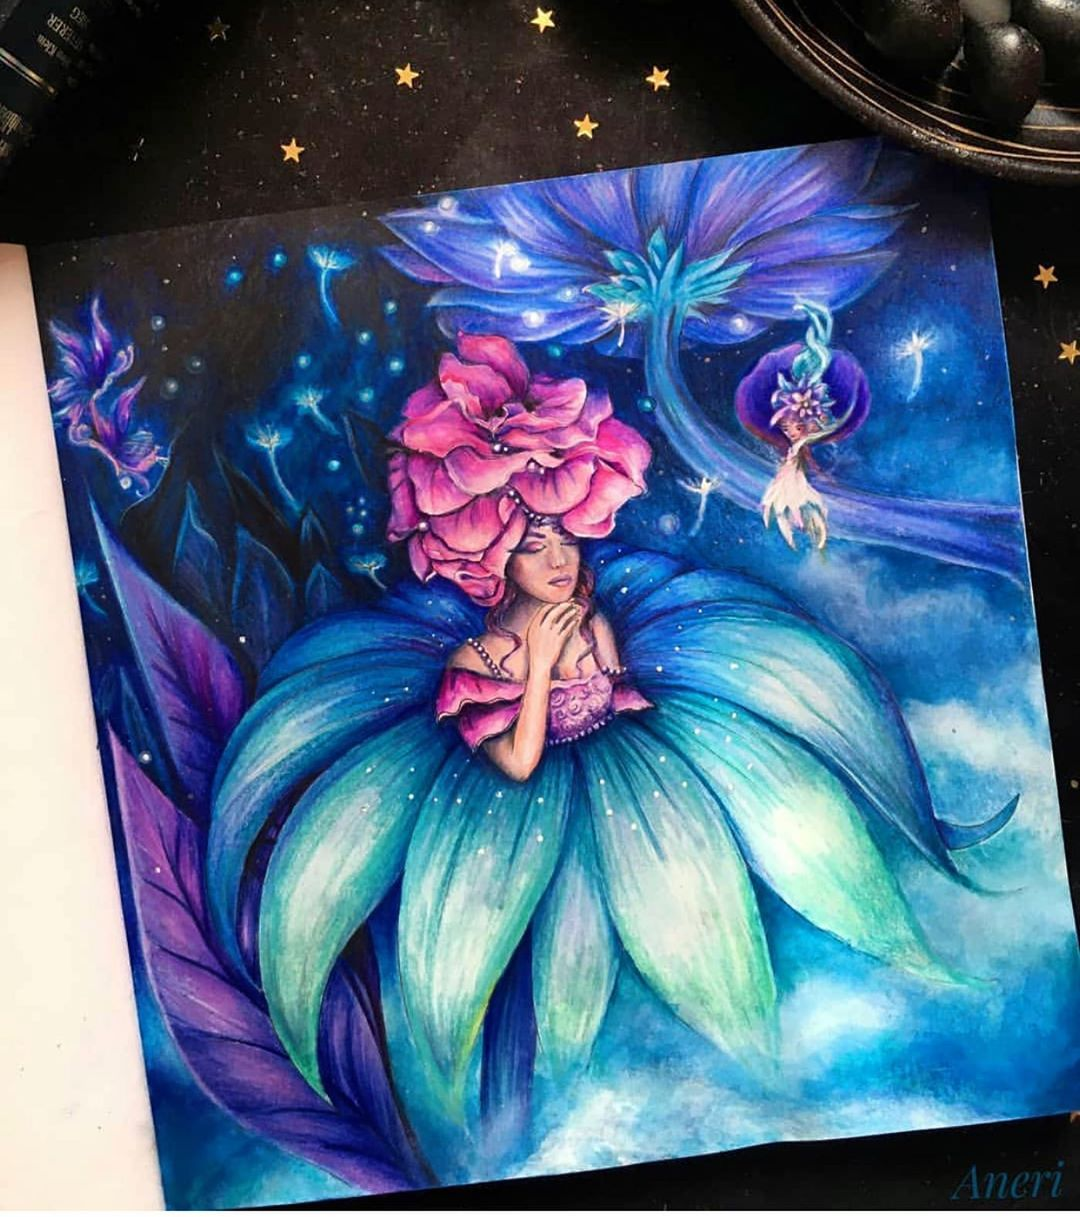 Gefallt 51 Mal 0 Kommentare Colorinodi Colorinodi Auf Instagram Happy Monday Fantastical By Black Aneri In 2020 Fantasy Lovers Coloring Books Fantasy